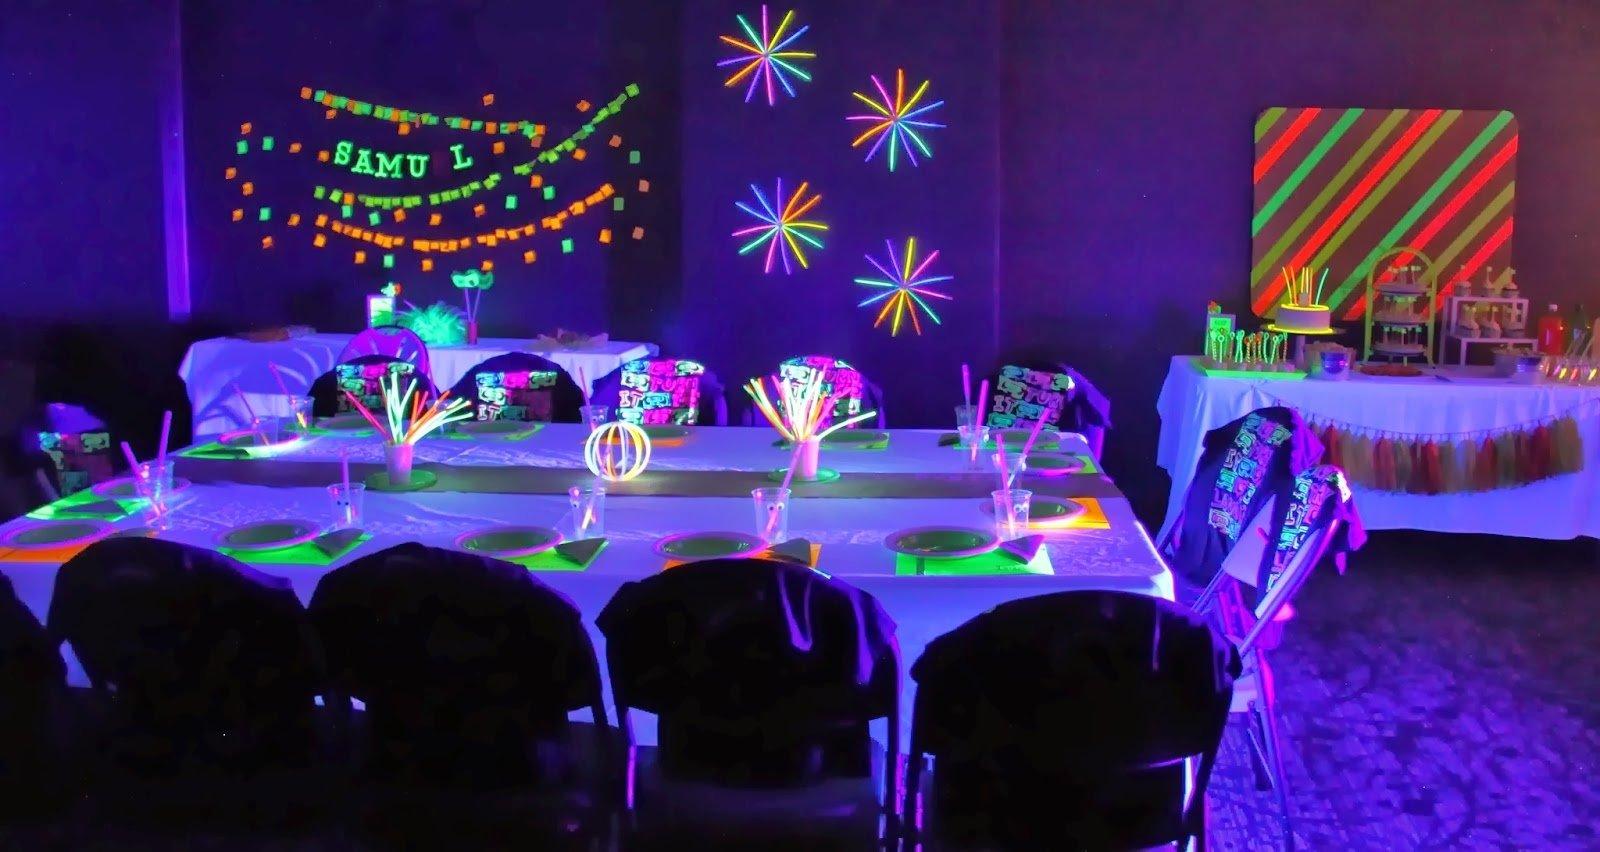 10 Pretty 16 Birthday Party Ideas For Boys sweet sixteen boy party ideas sweet 16 party ideas for boys 16th 3 2021